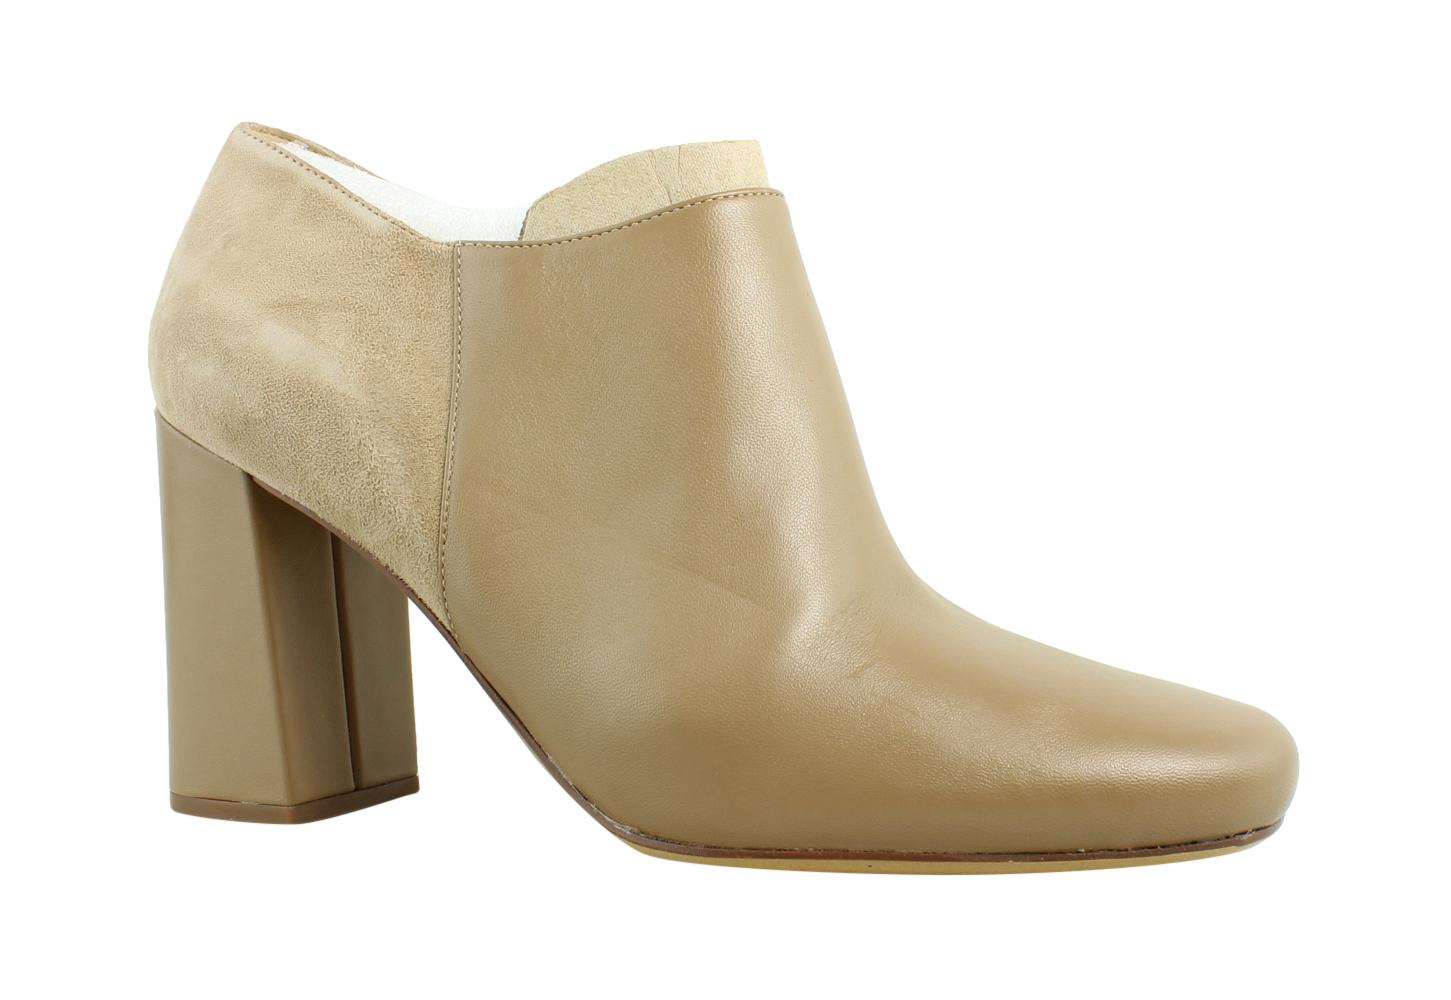 New Naturalizer Womens F2851l1 Oatmeal Fashion Boots Size 10 by Naturalizer